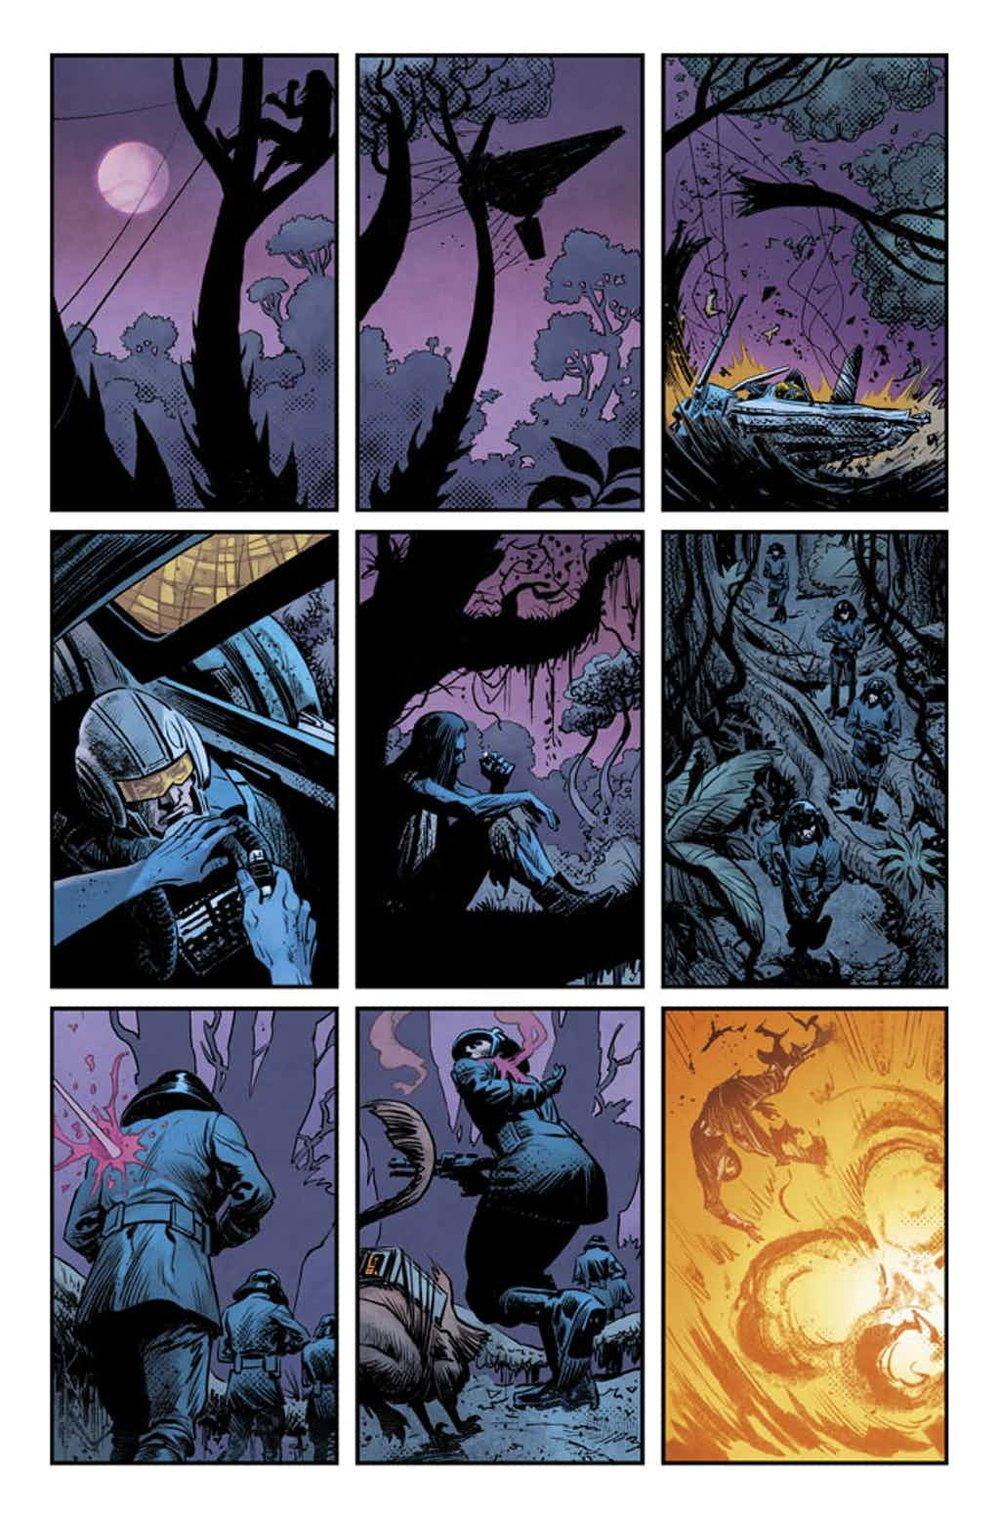 Marvel-Thrawn-Comic-Page-2.jpg